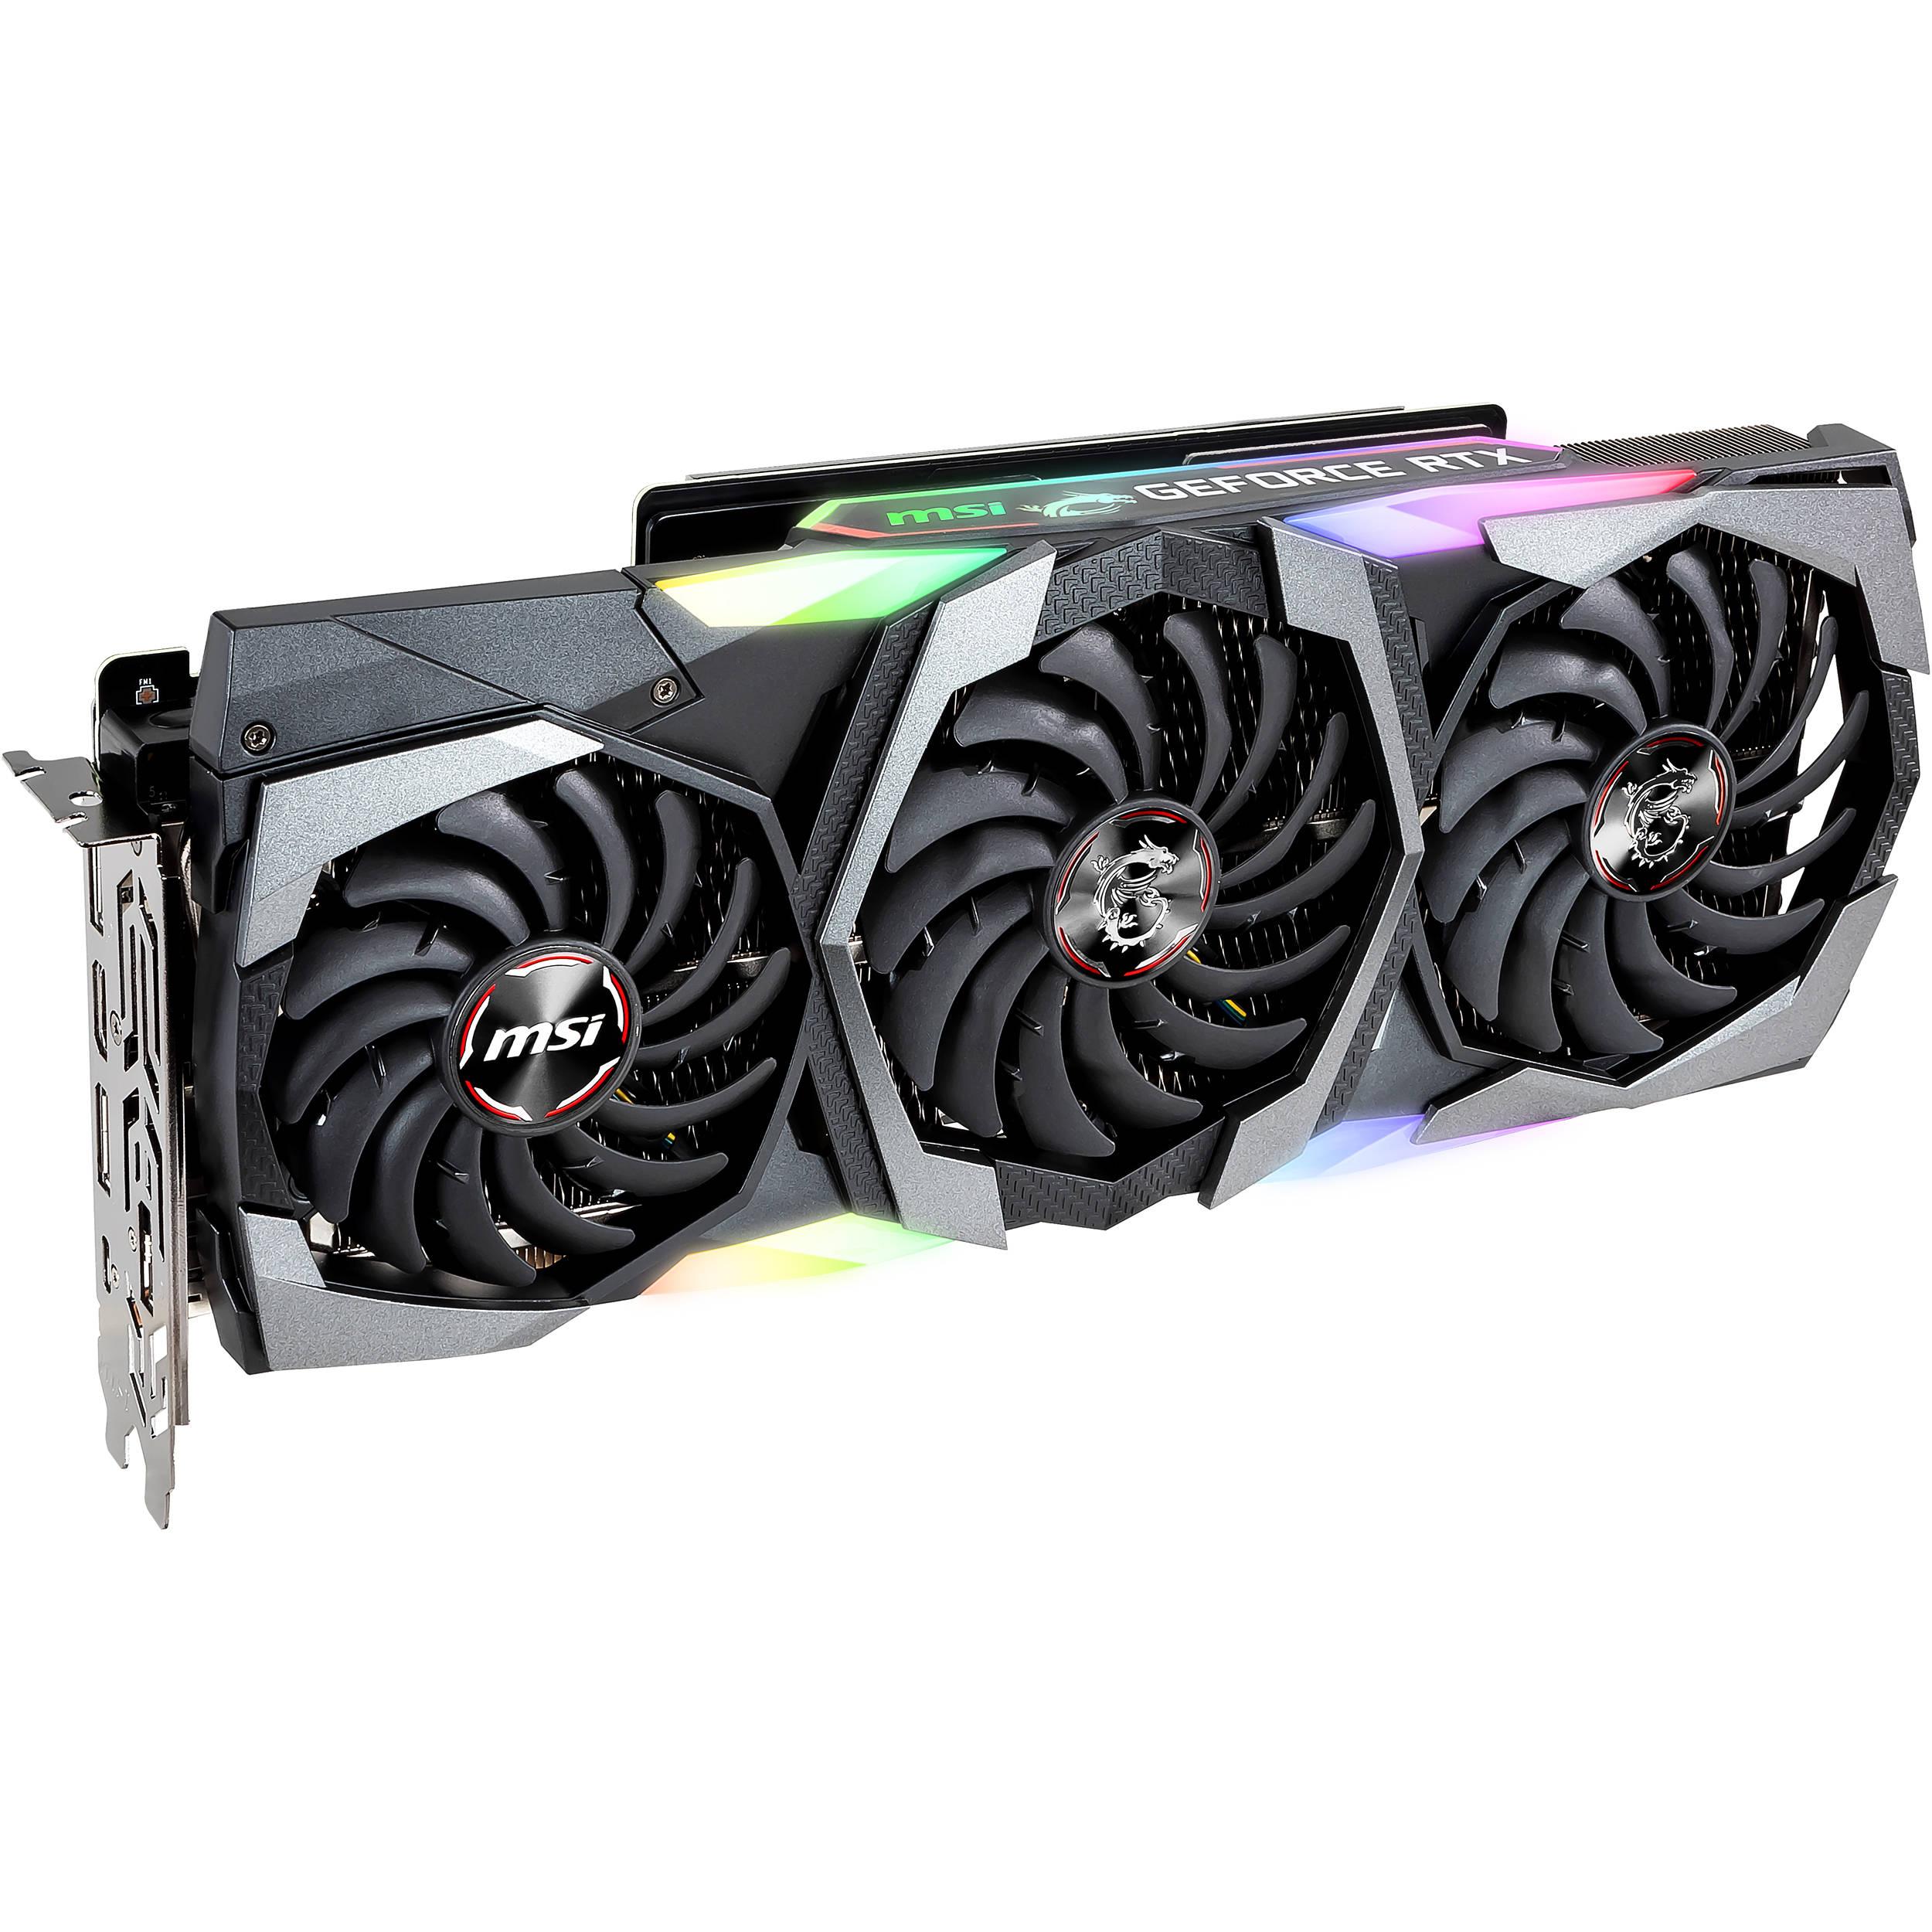 MSI GeForce RTX 2080 SEA HAWK X Graphics Card